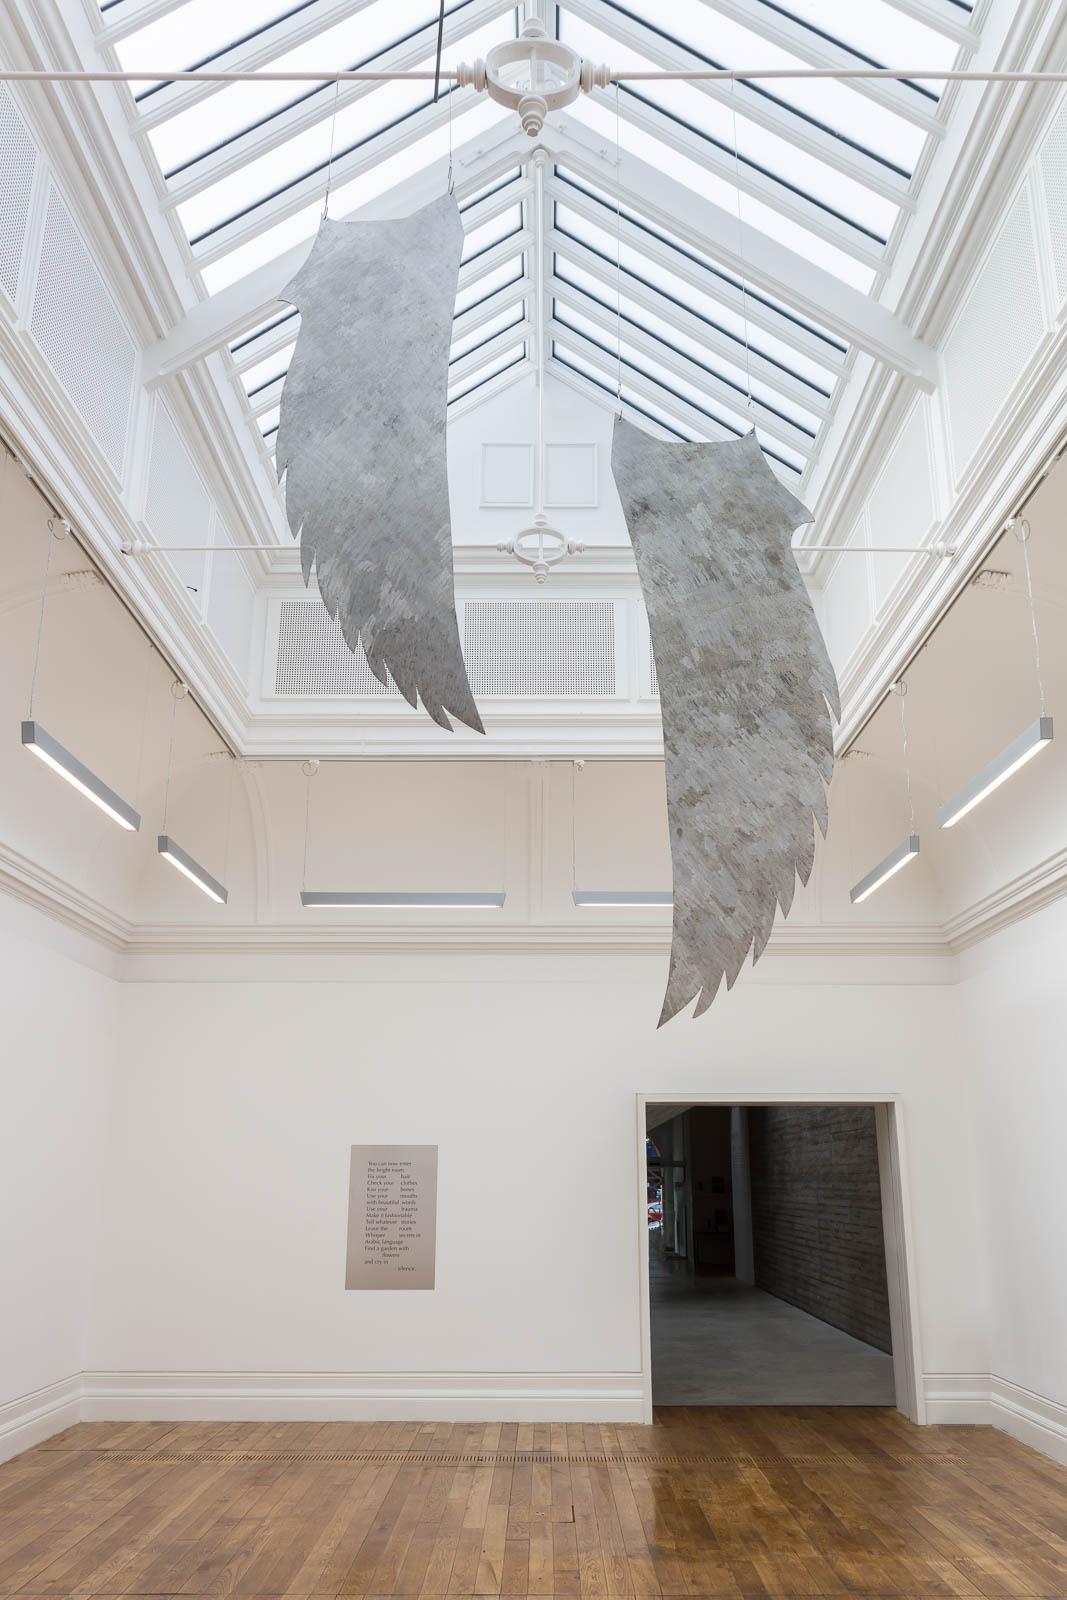 Tarek Lakhrissi, My Immortal, 2021. Installation view. MOSTYN, Llandudno, UK. Photographer: Mark Blower.